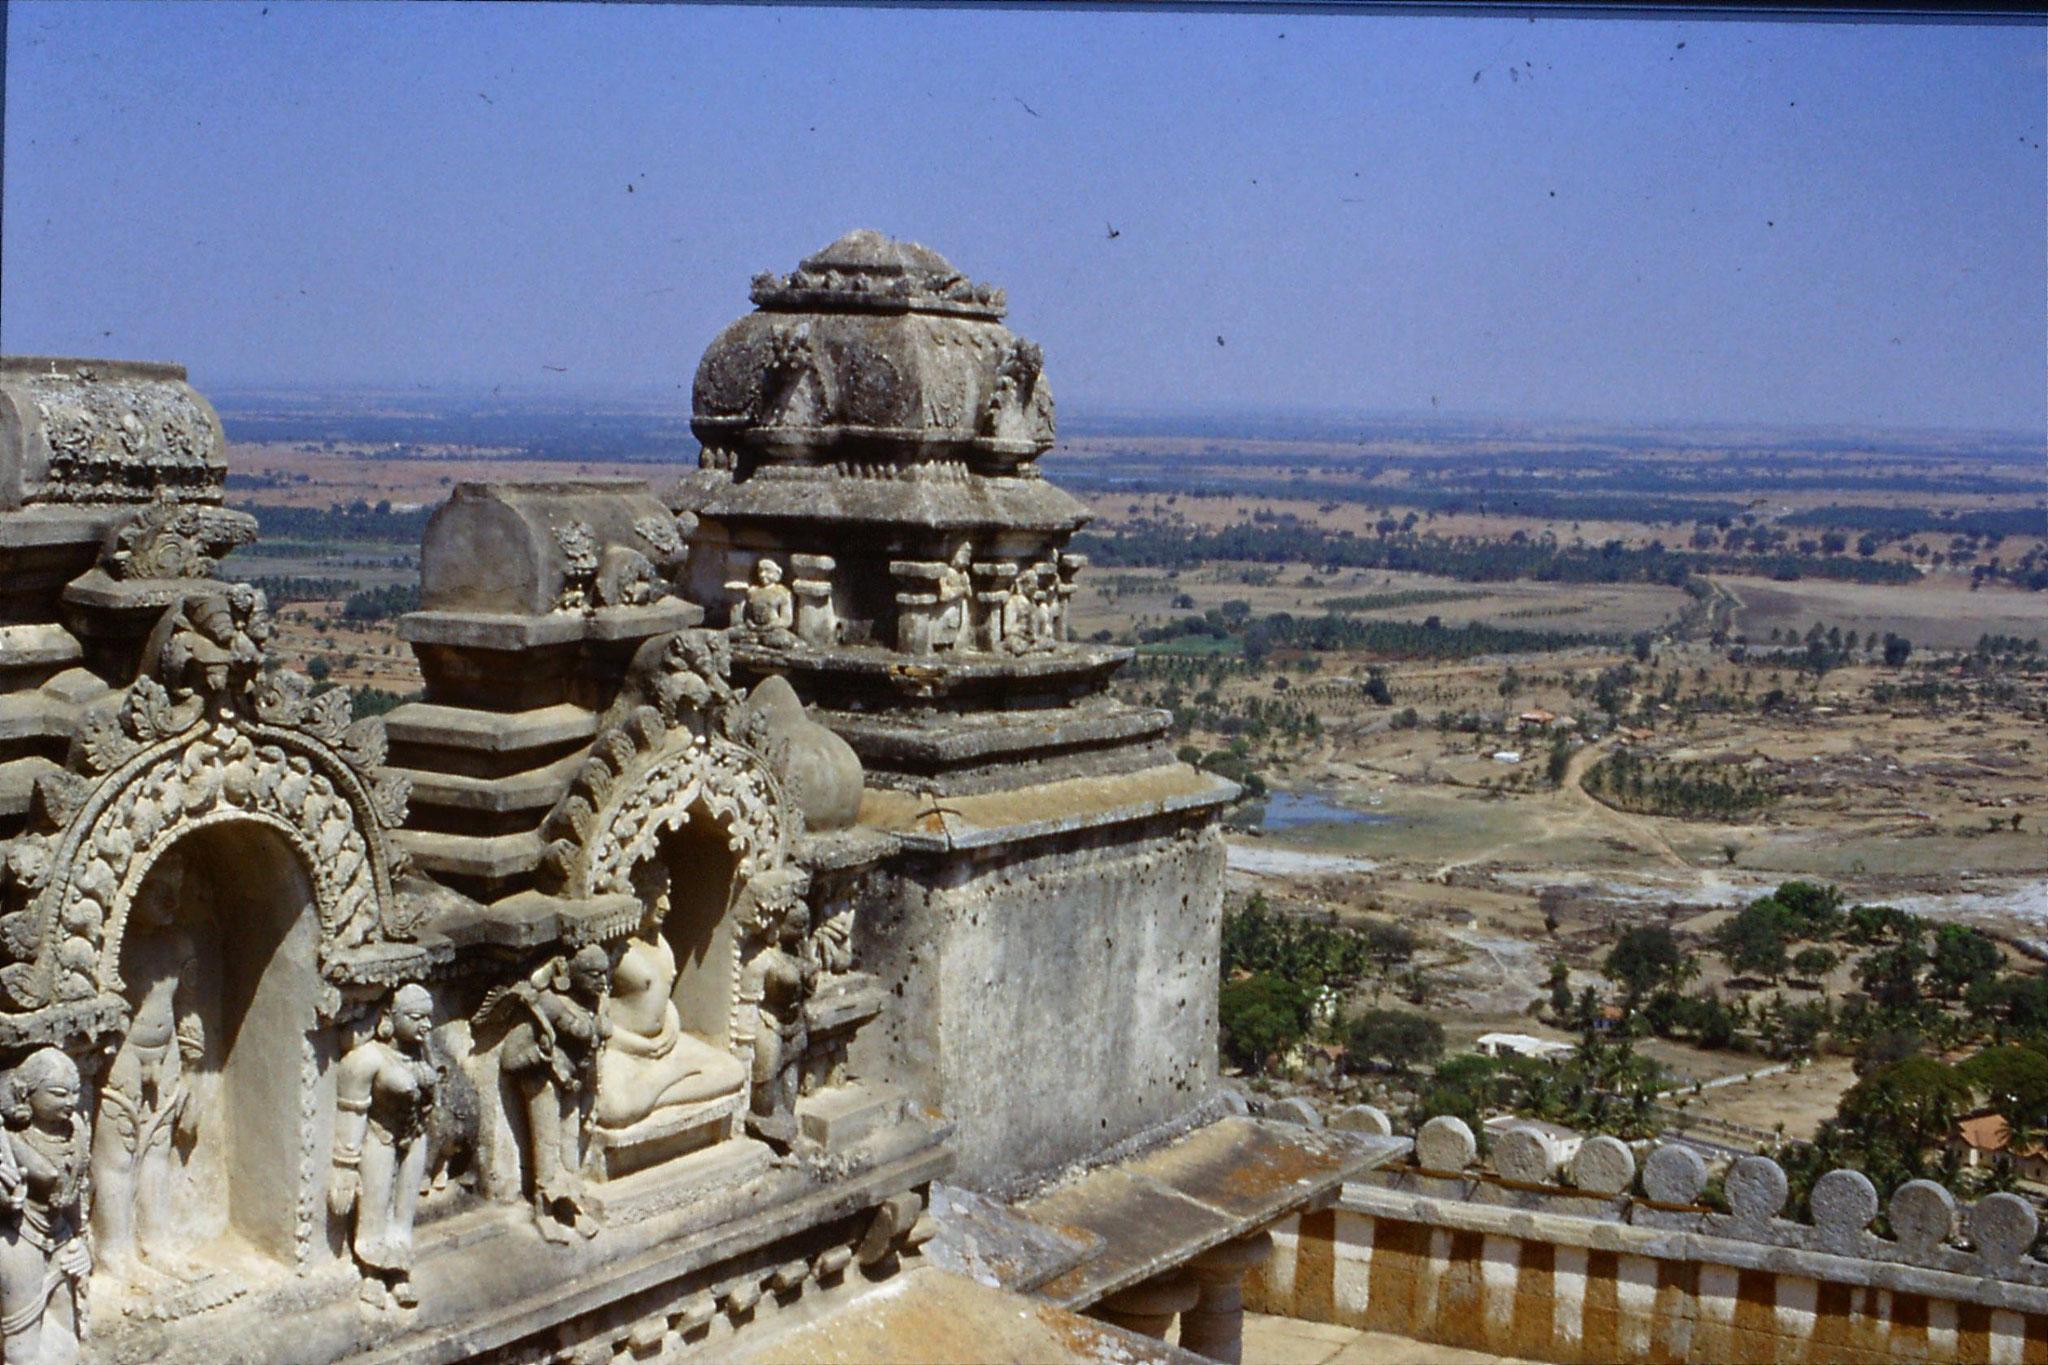 108/12: 13/3/1990 Sravanabelagola - NE from temple